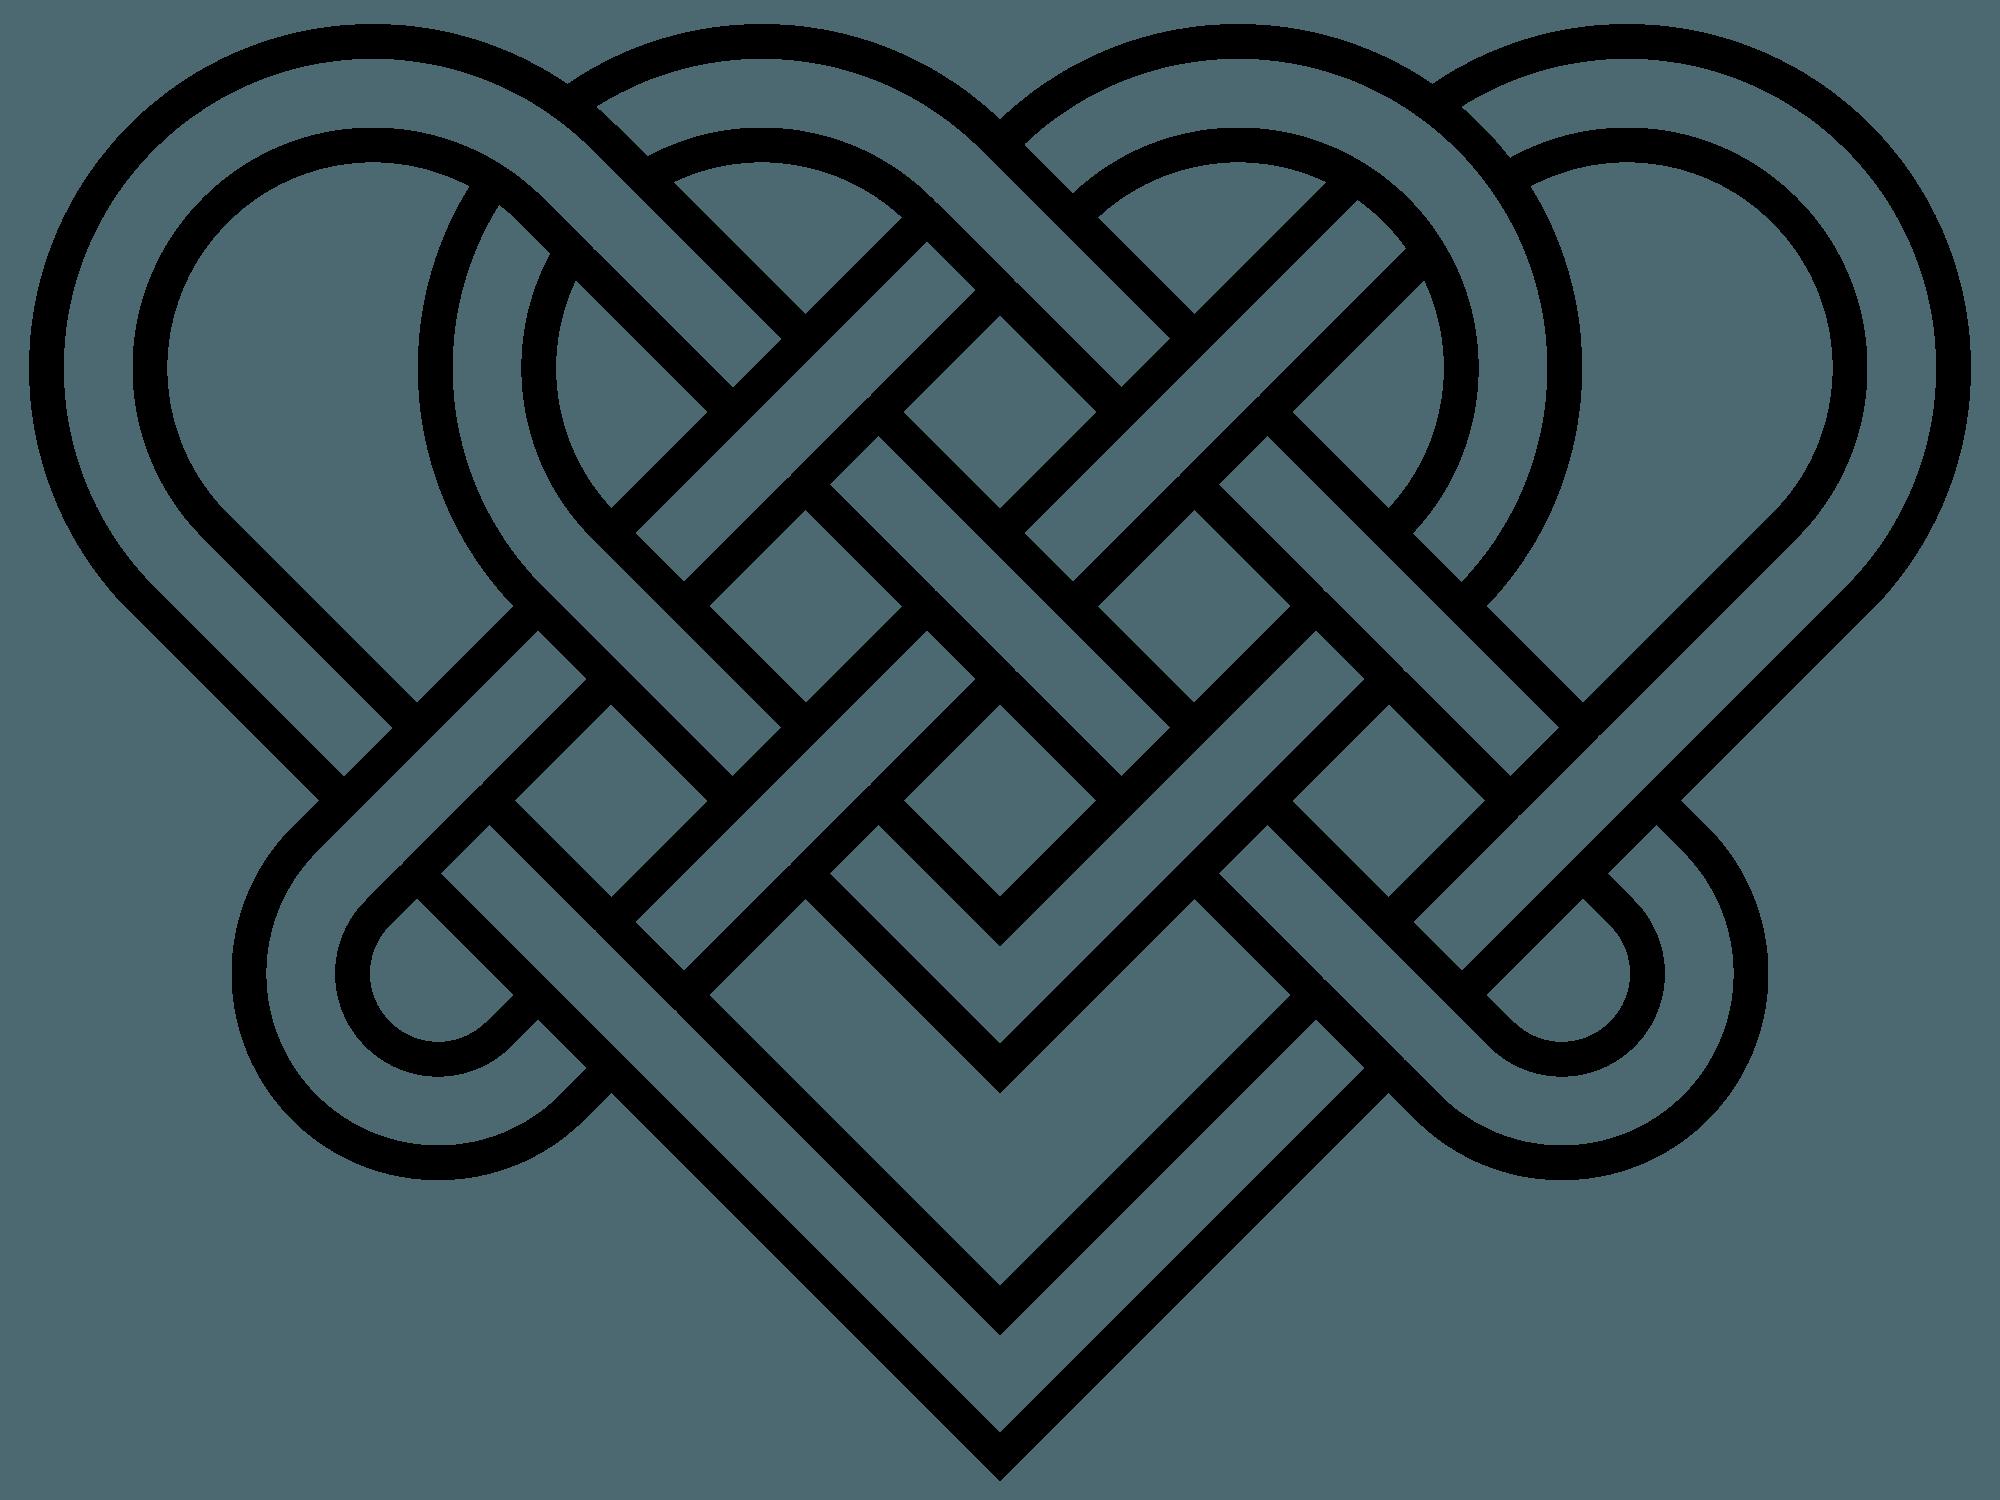 Celtic clipart page corner Borders Outsanding clipart Celtic Home